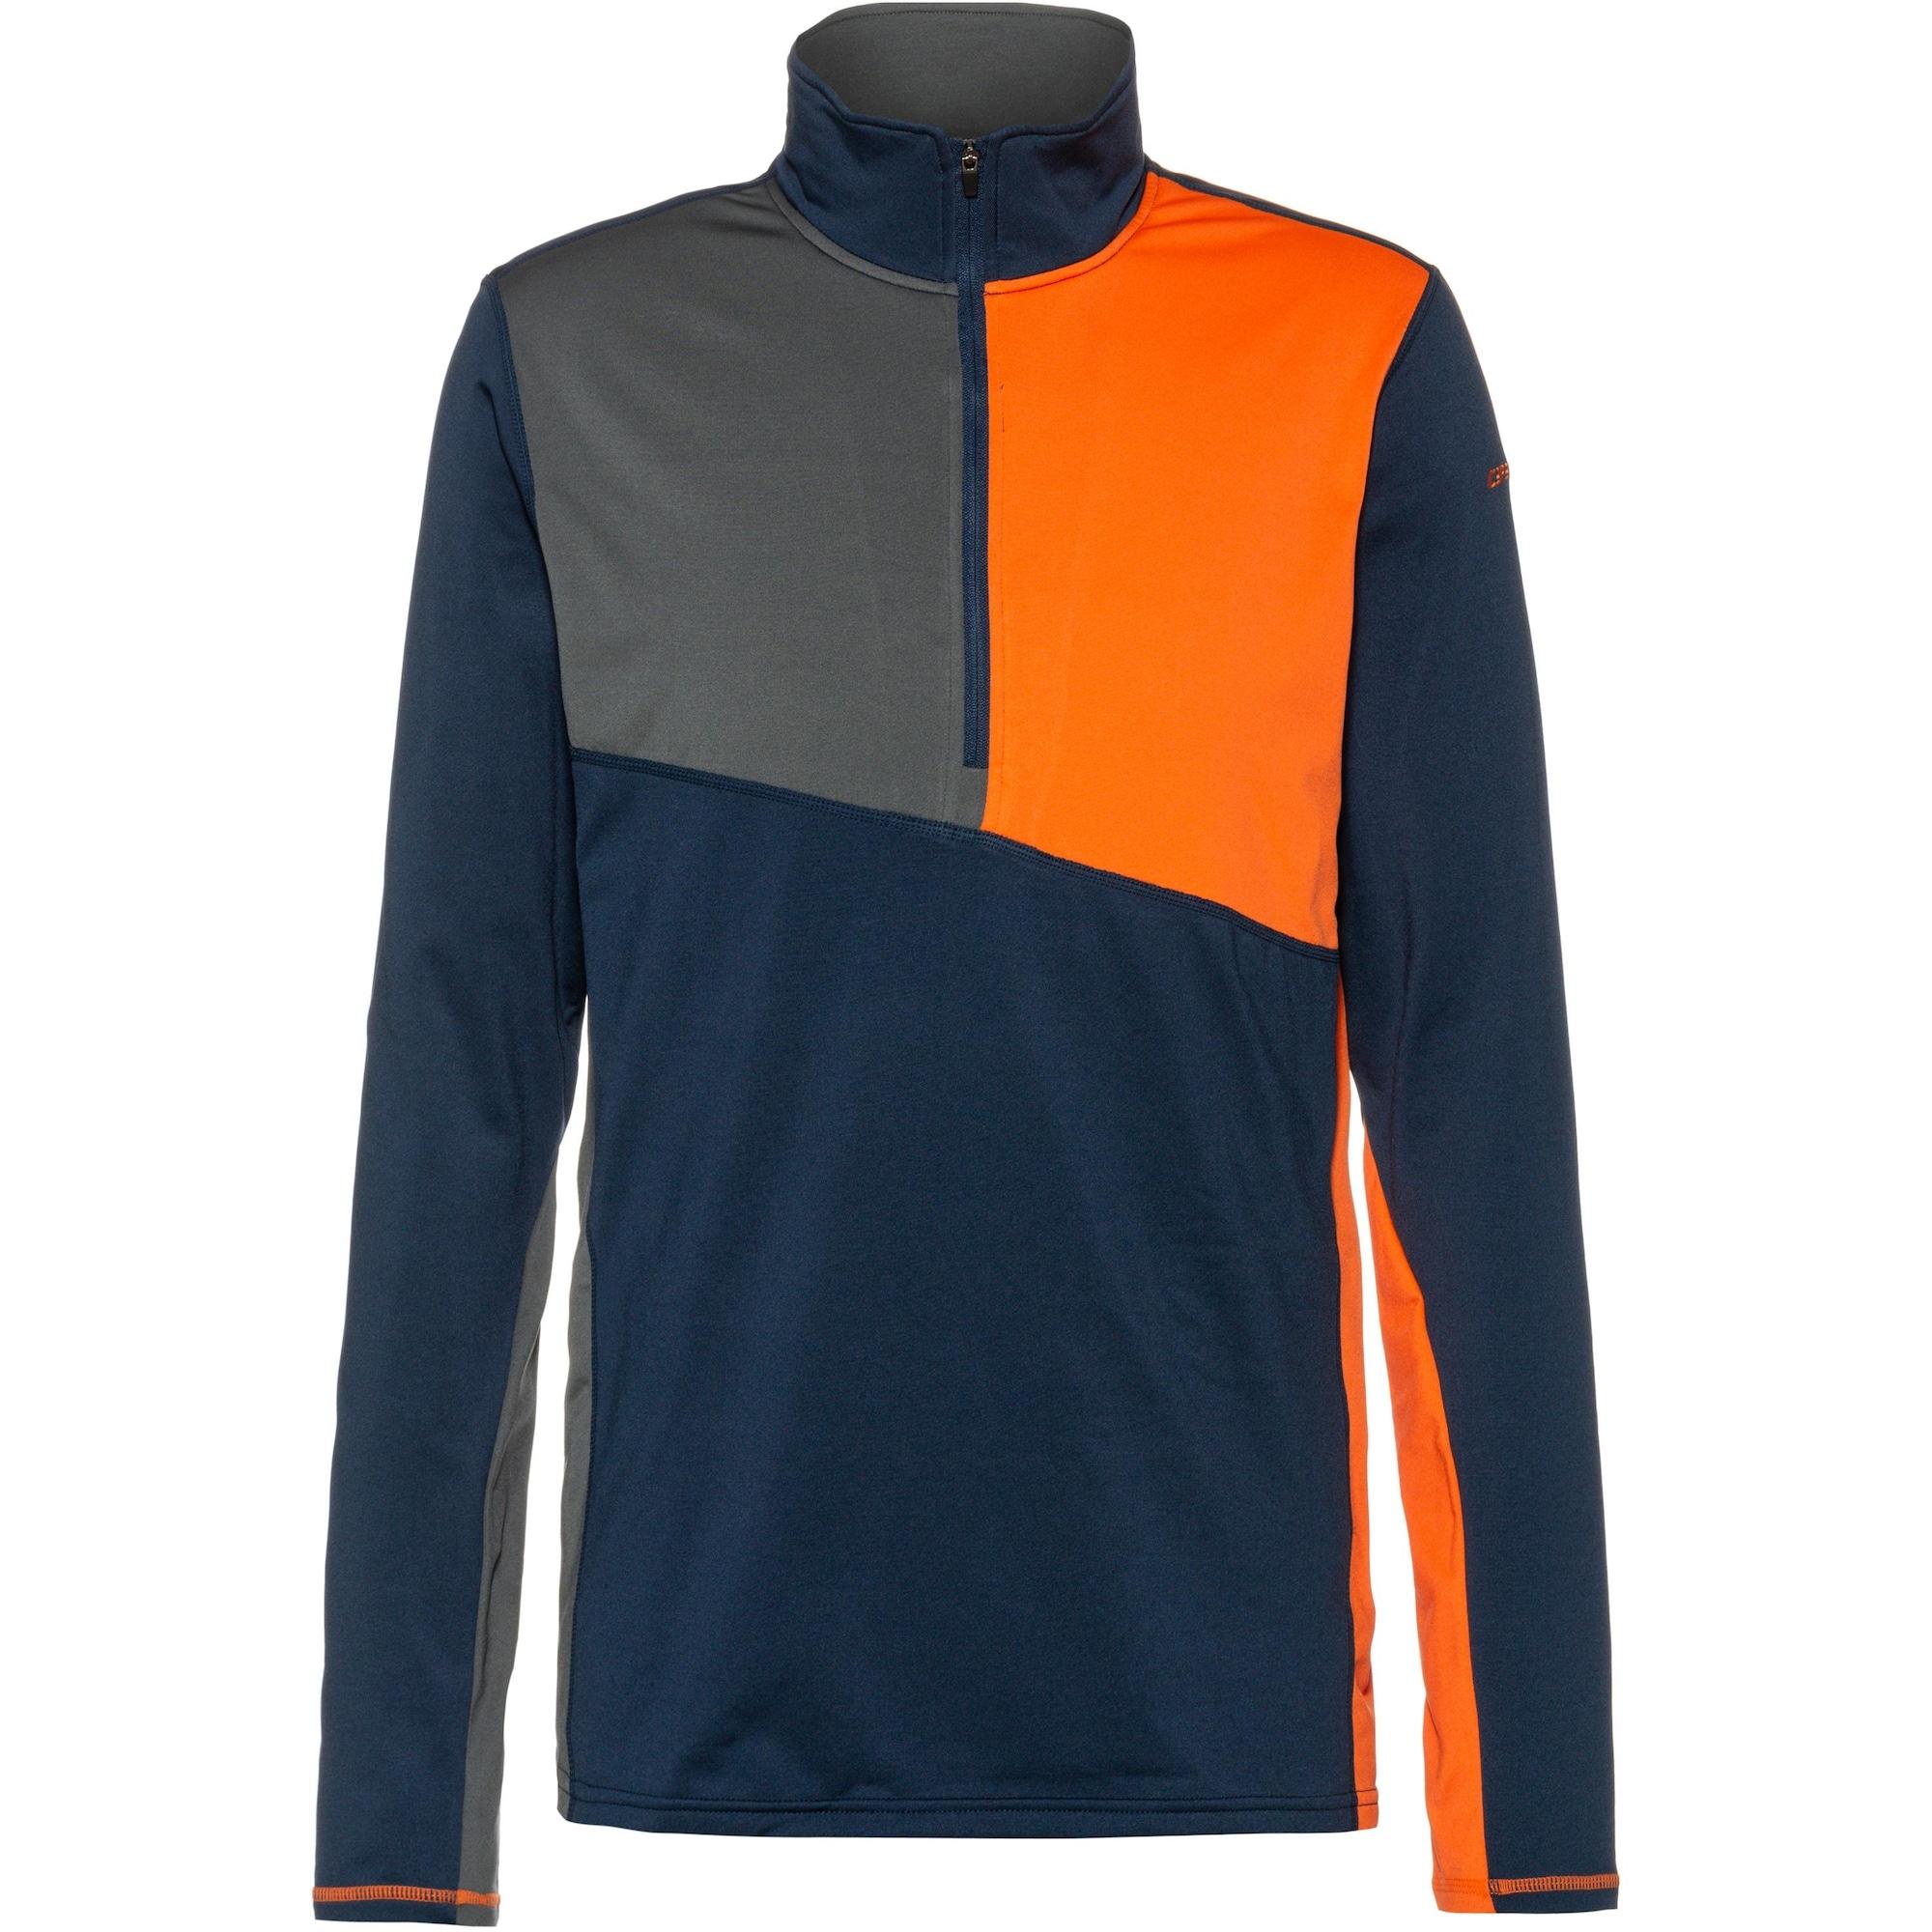 Funktionsshirt 'Cope' | Sportbekleidung > Sportshirts > Funktionsshirts | icepeak